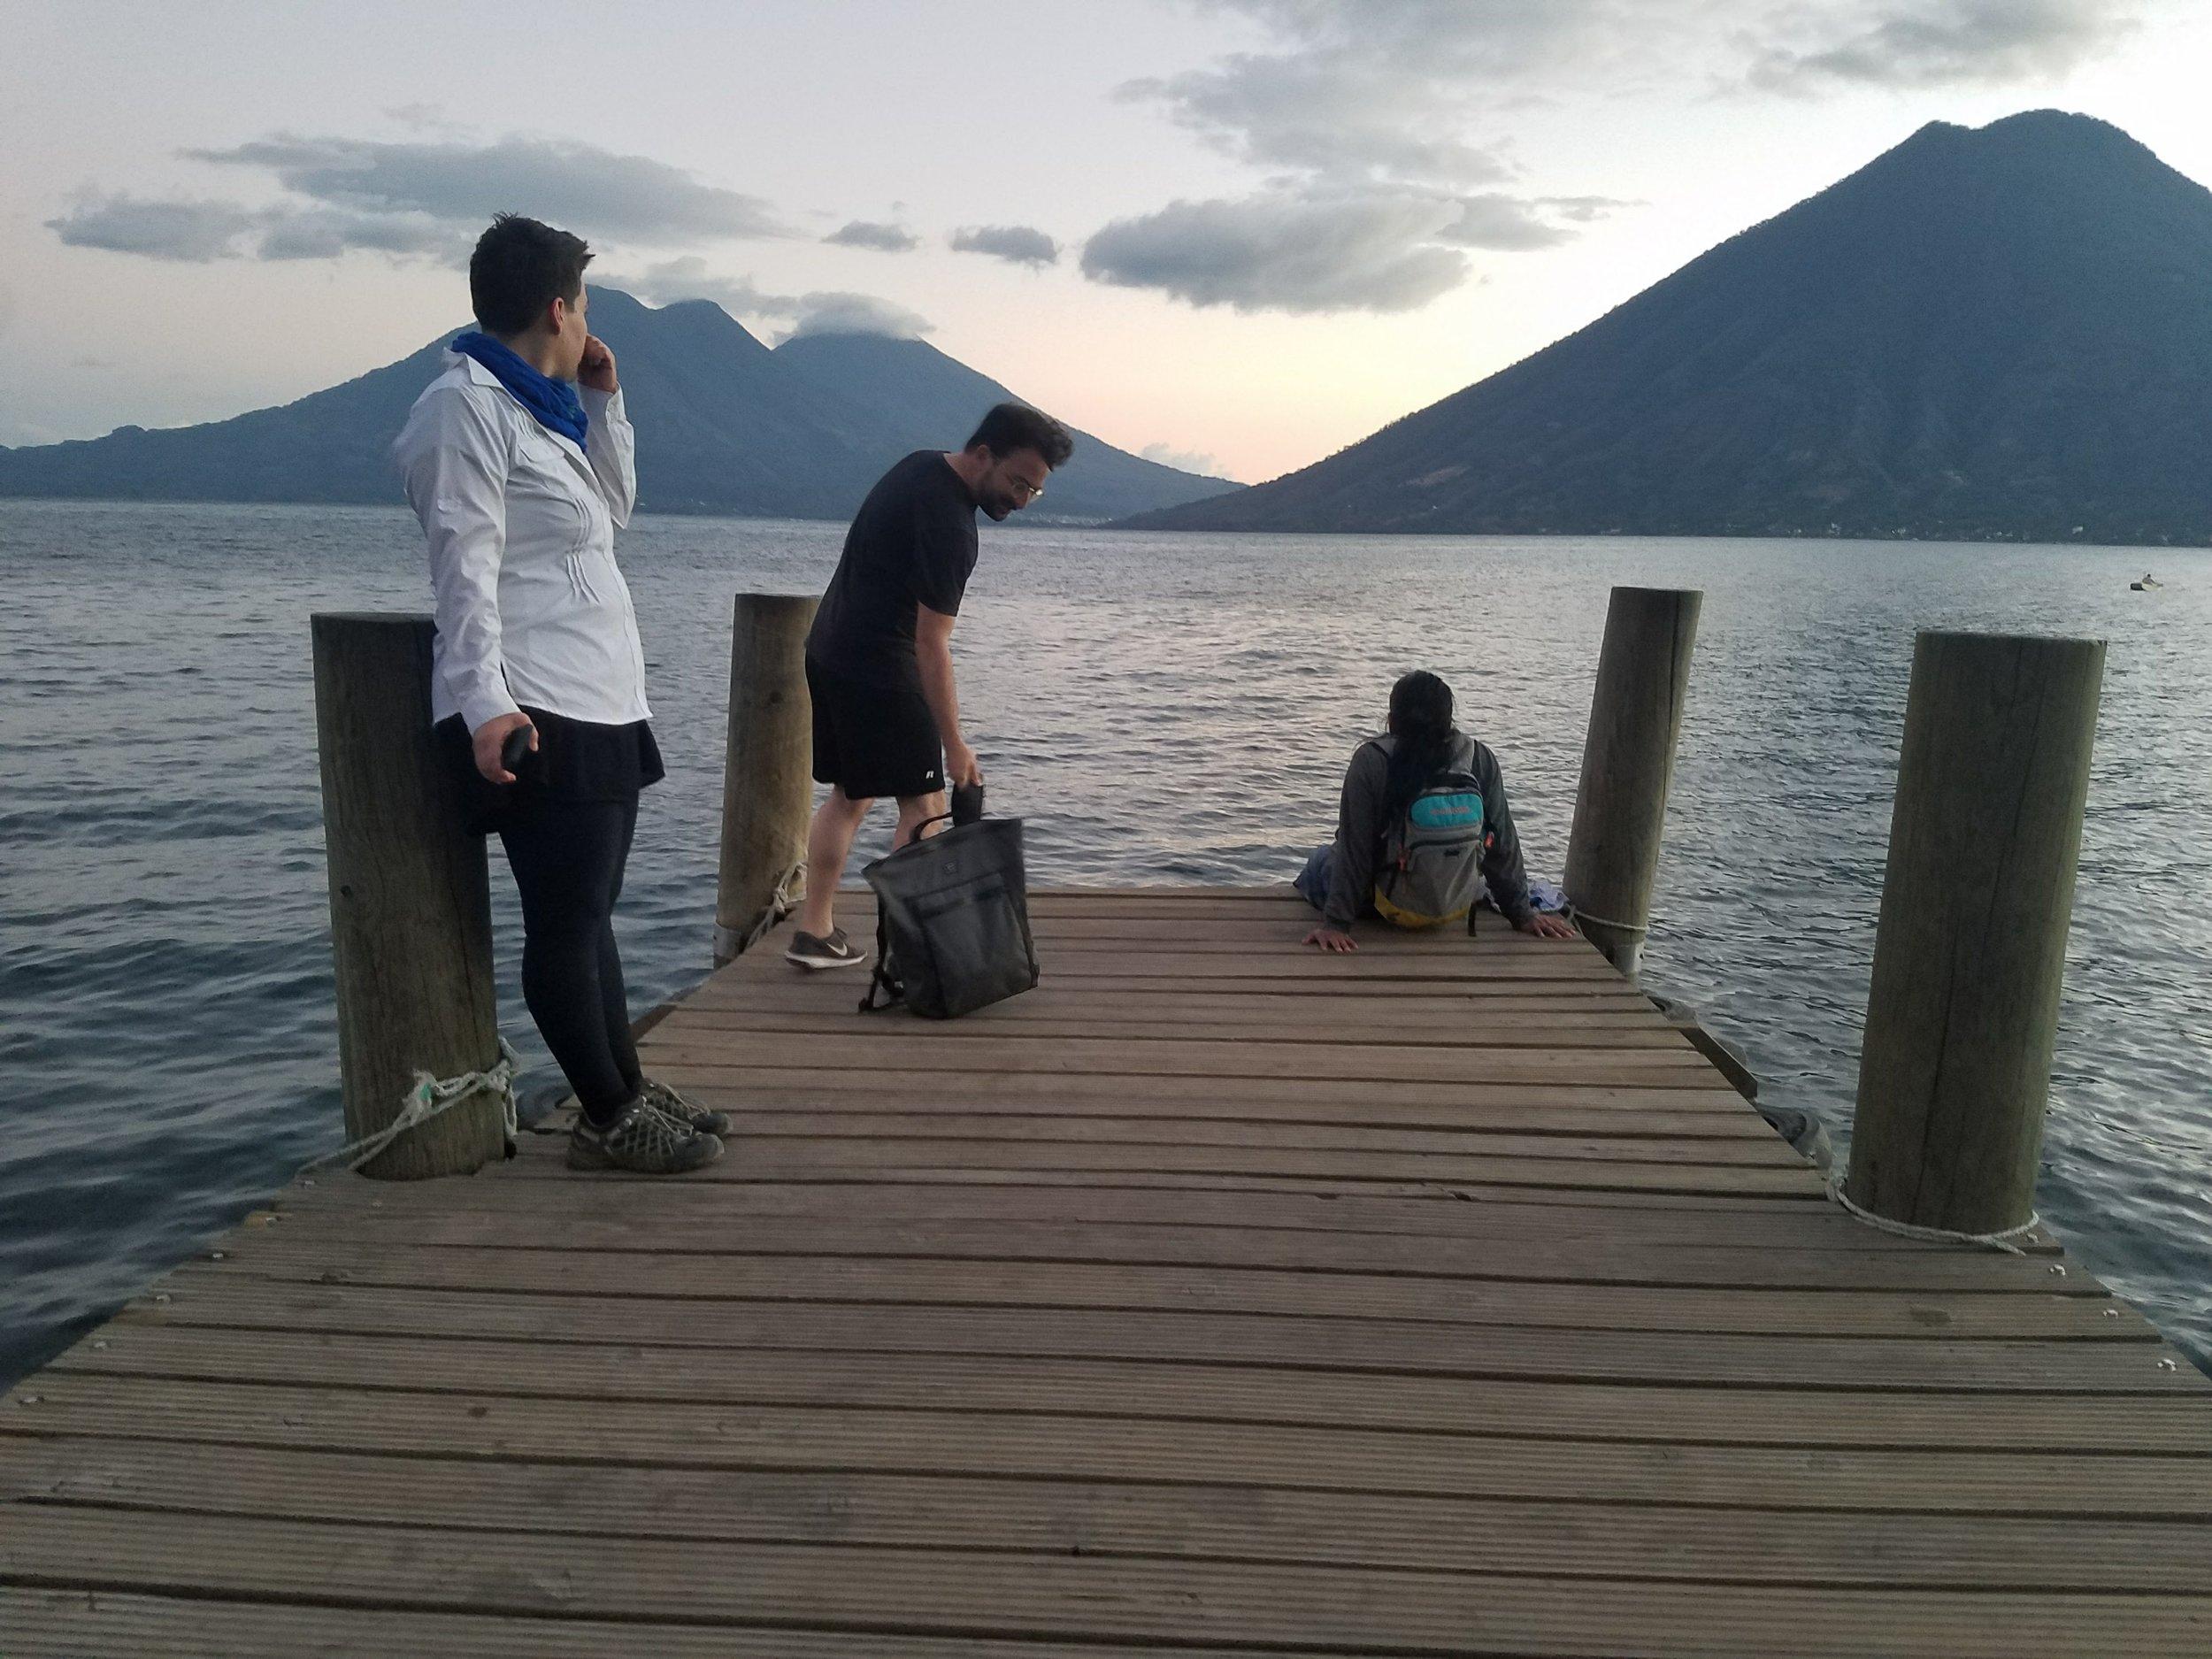 Residencia Yvonne Lily Cox-Richard, Andy Campbell, Manuel Chavajay, Lago Atitlán